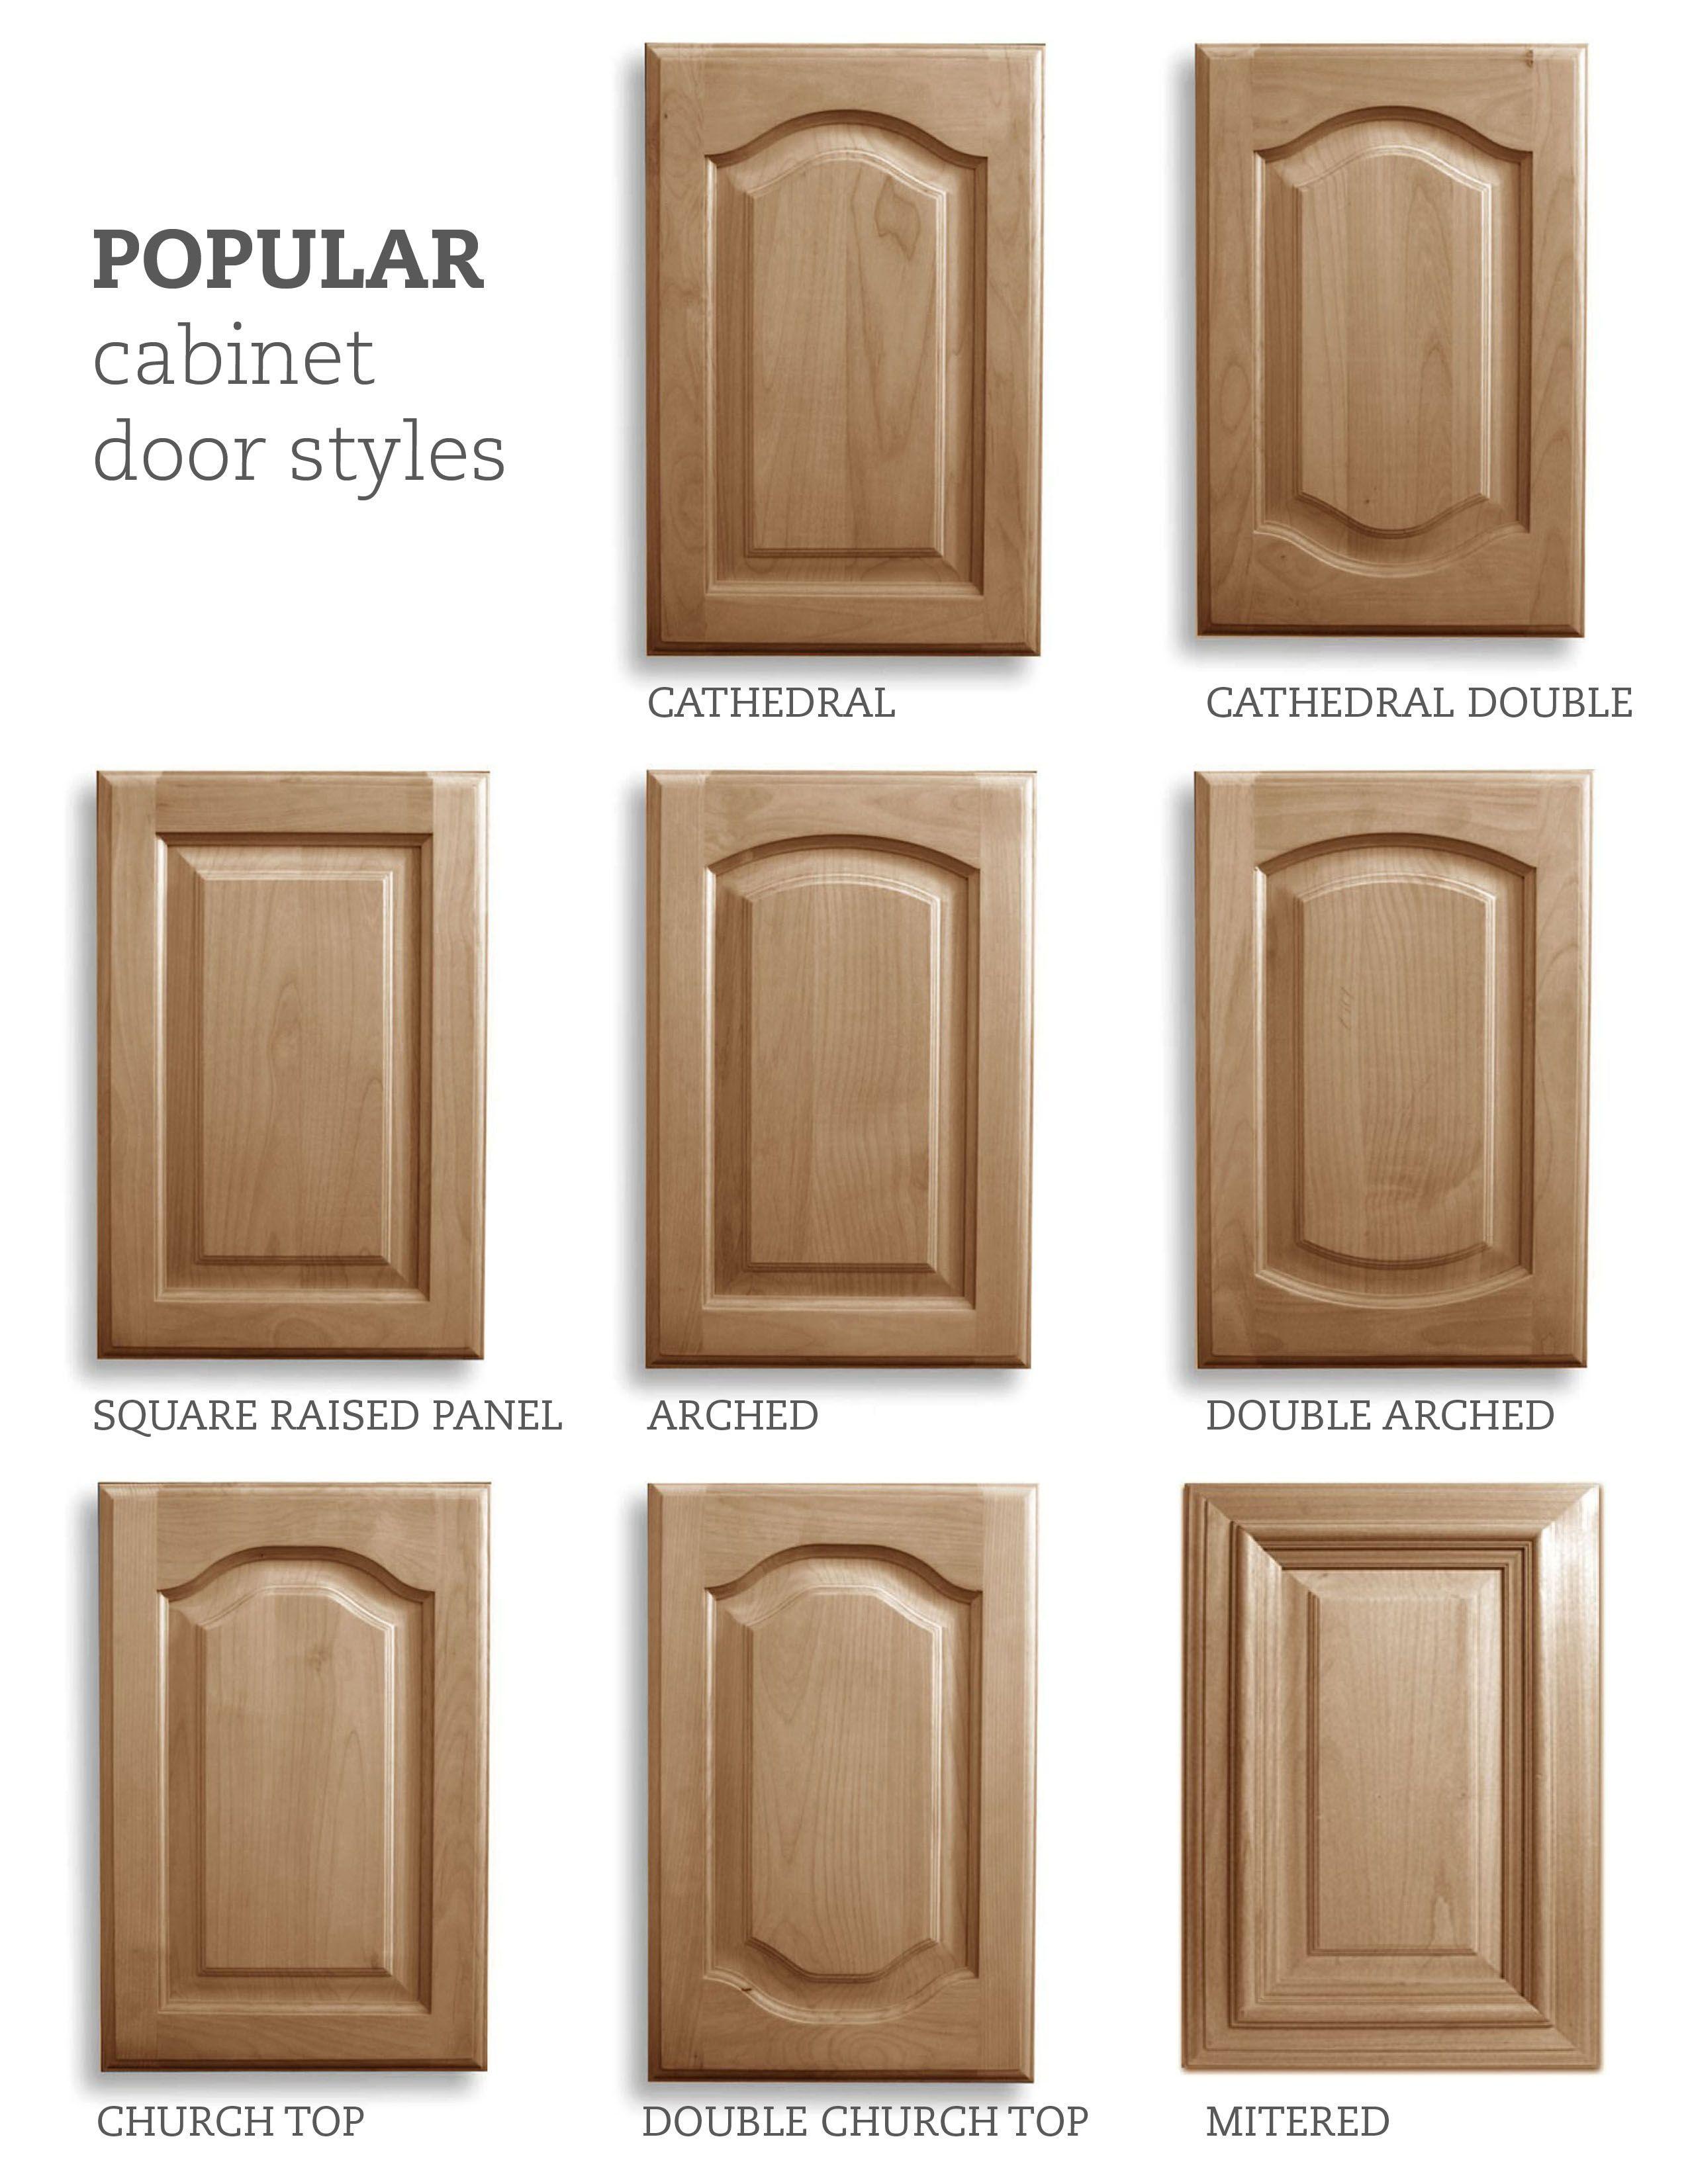 Raised Panel Oak Cabinet Doors In 2020 Kitchen Cabinet Door Styles Cabinet Door Designs Cabinet Doors